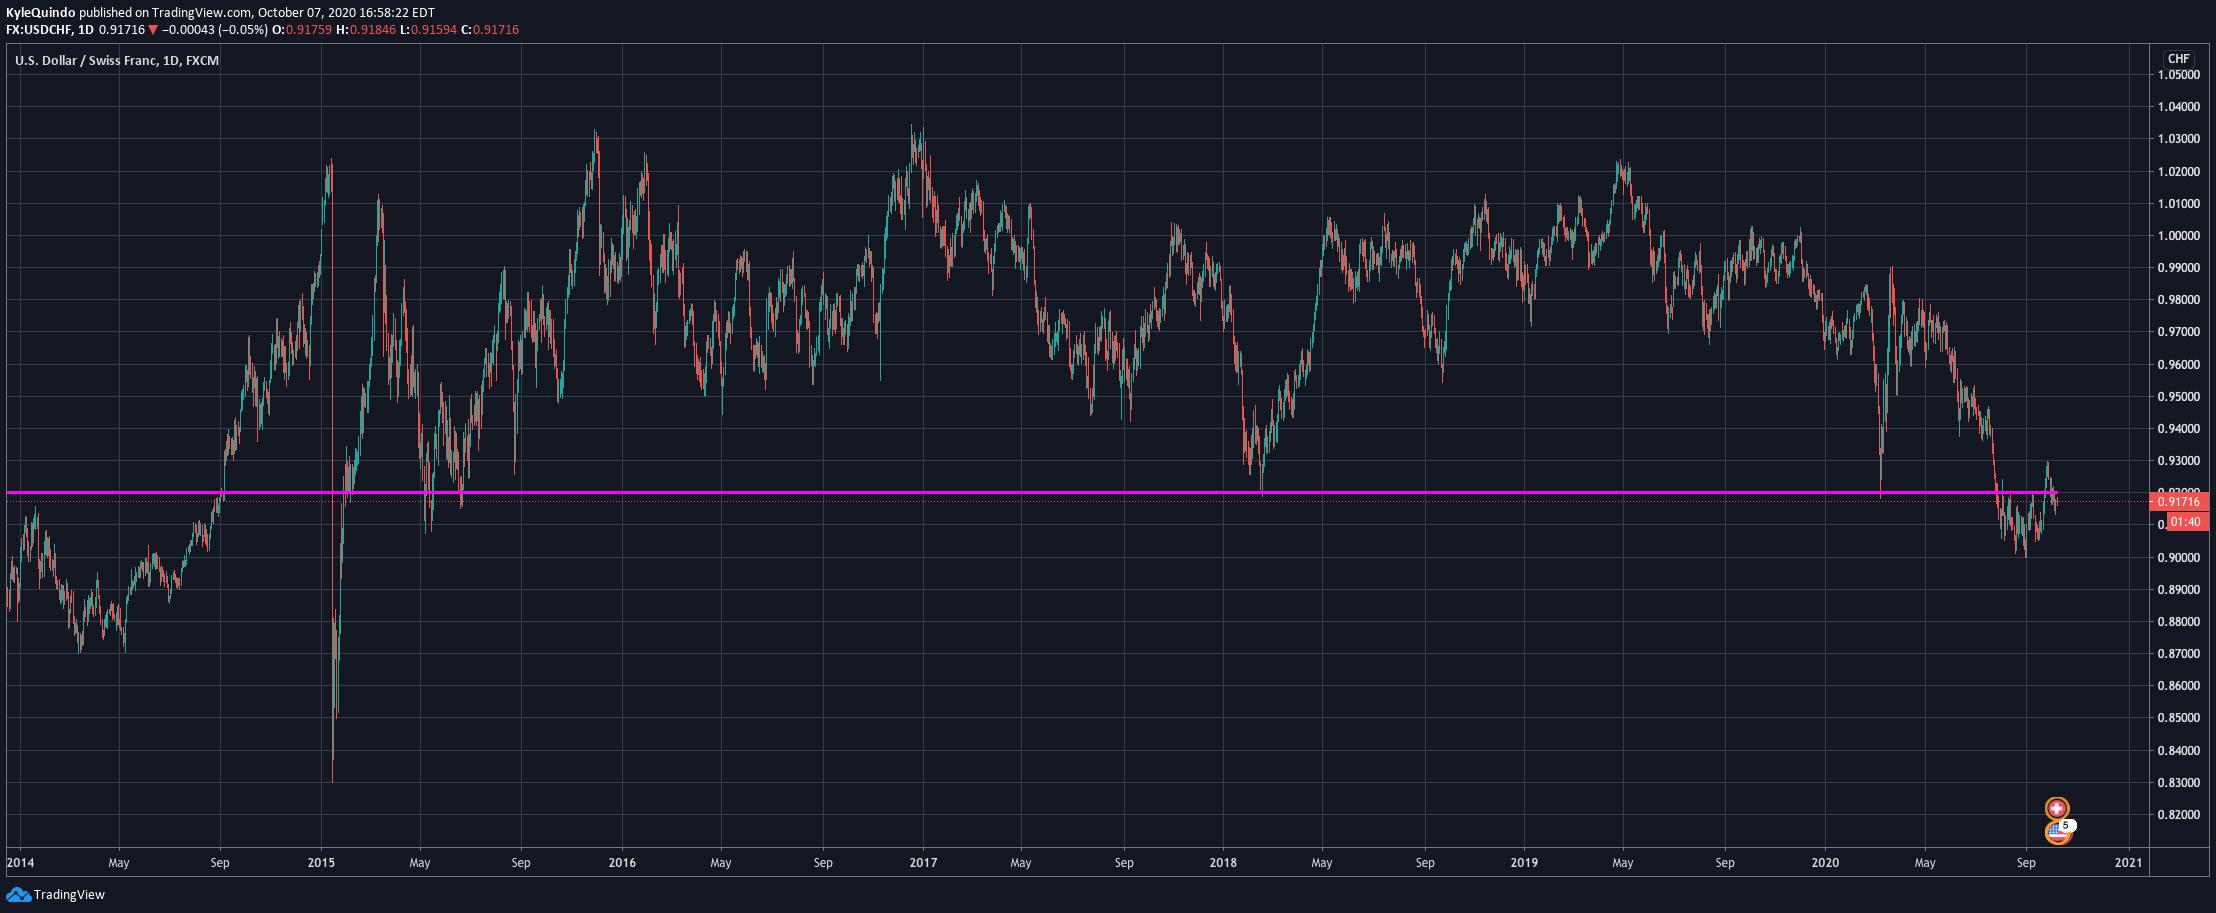 Swiss Franc: Heading below 0.92 against the USD?